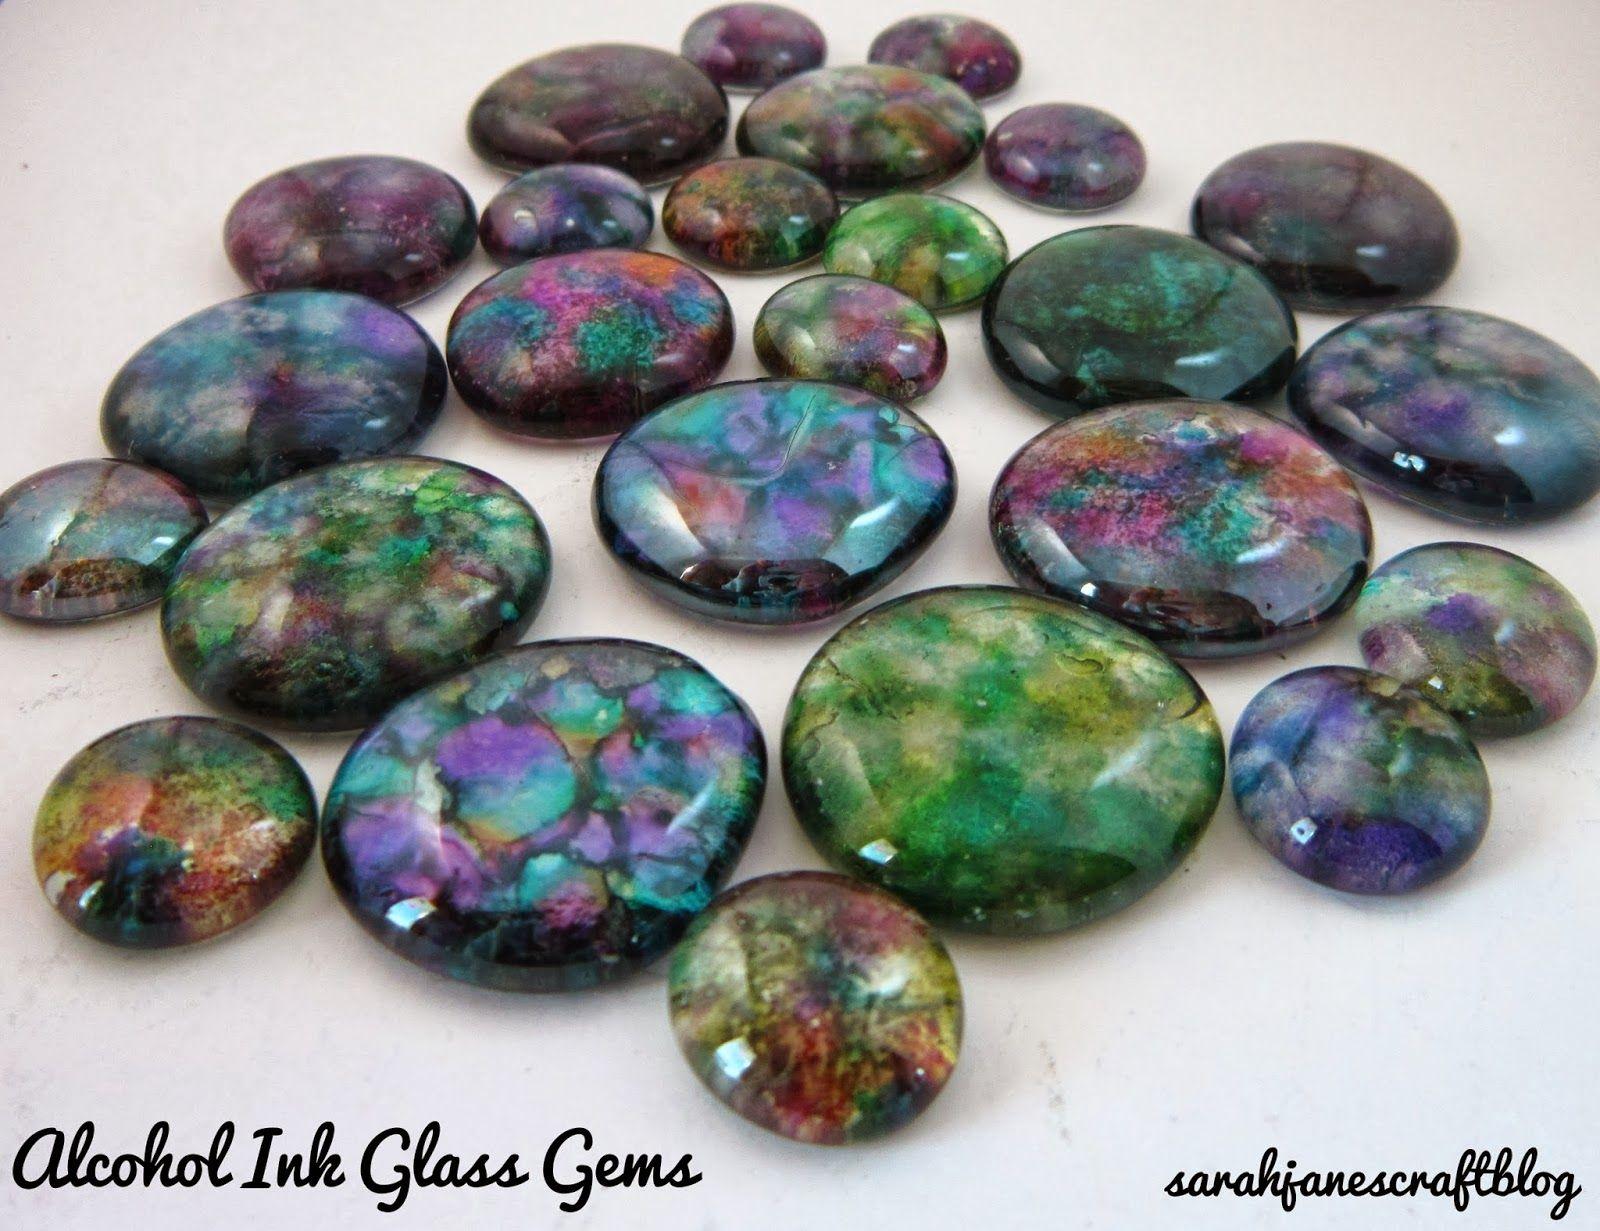 Alcohol Ink Glass Gems